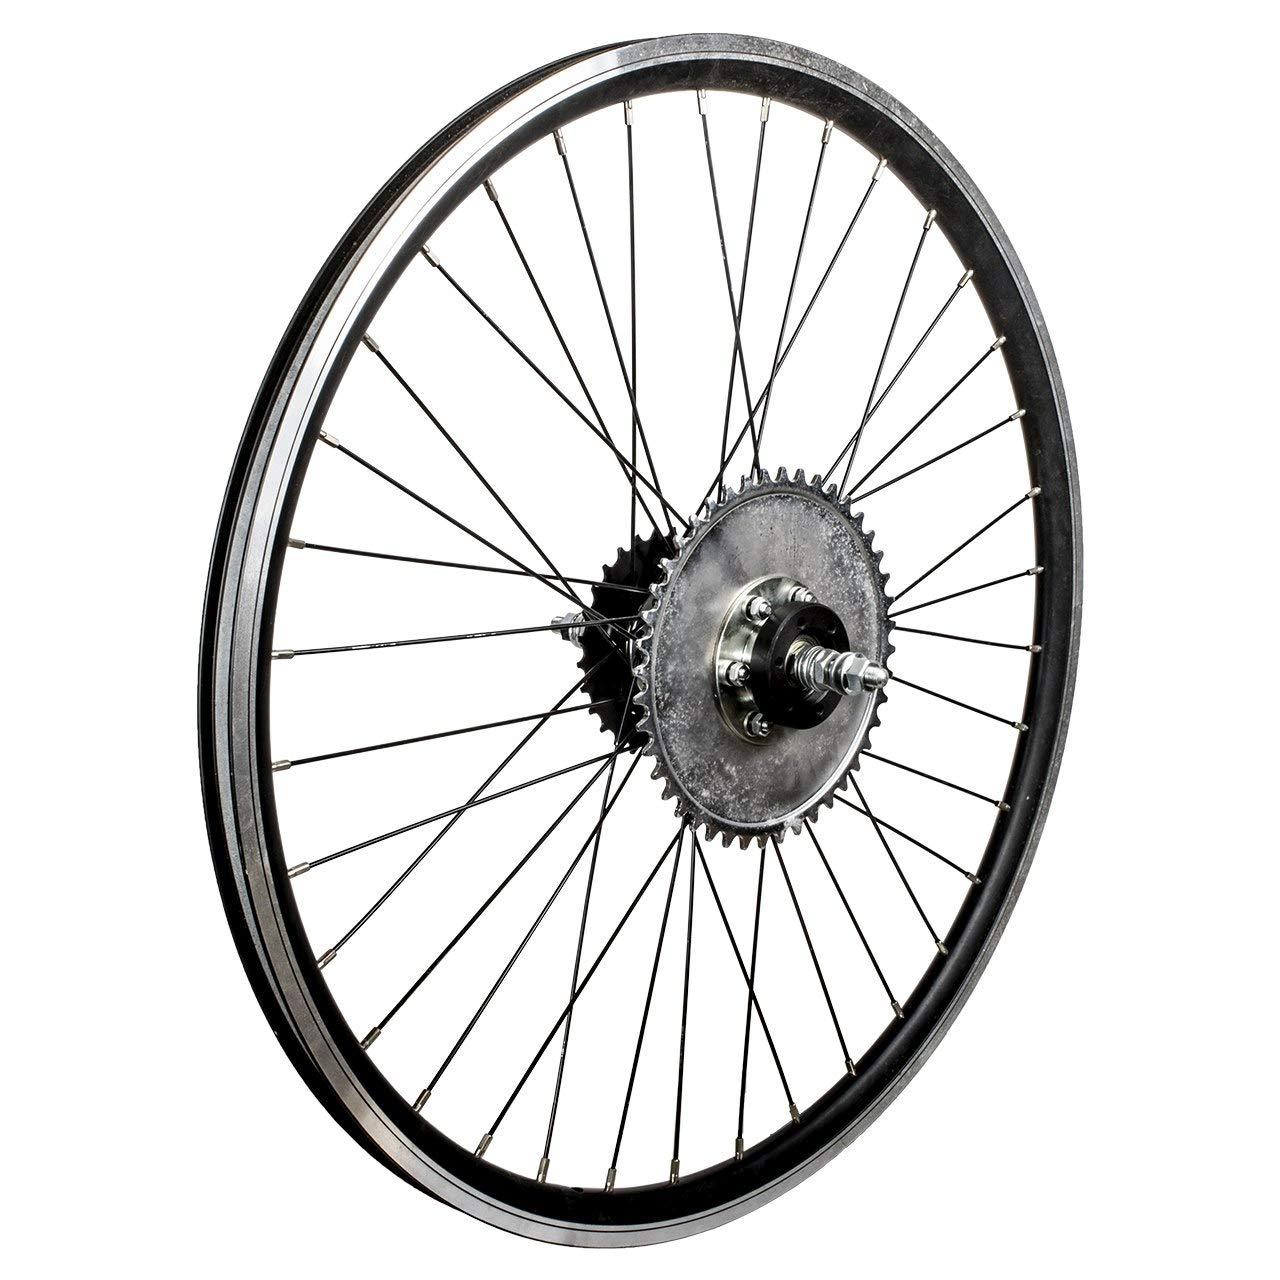 Gru-Bee HD Bike Wheel and Axle Kit by Gru-Bee